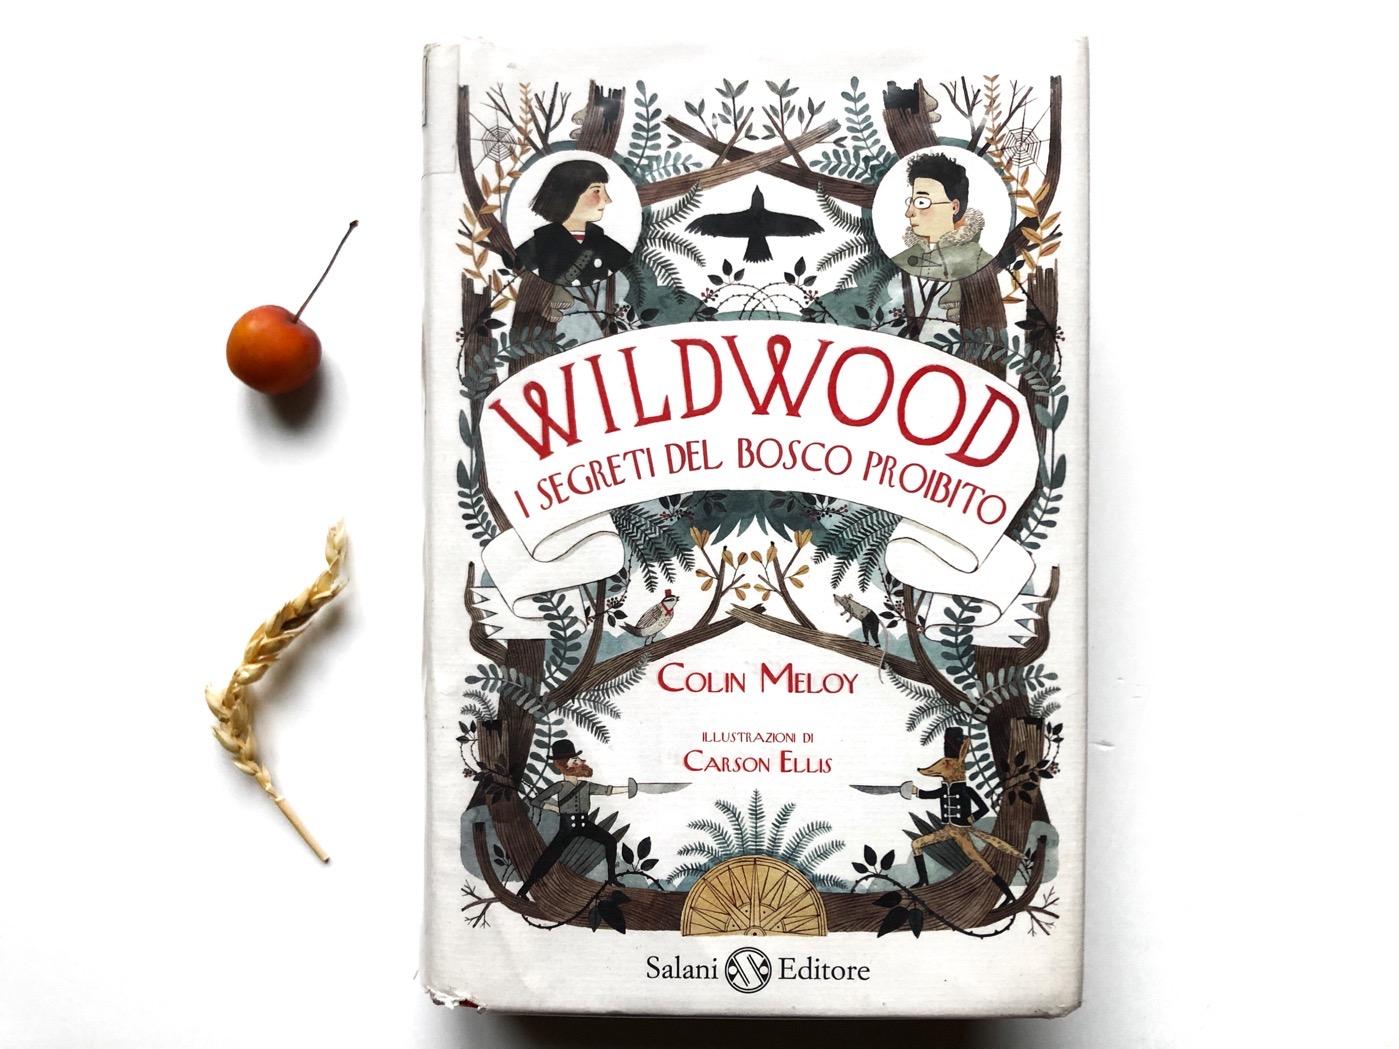 wildwood-colin-meloy-carson-ellis-salani